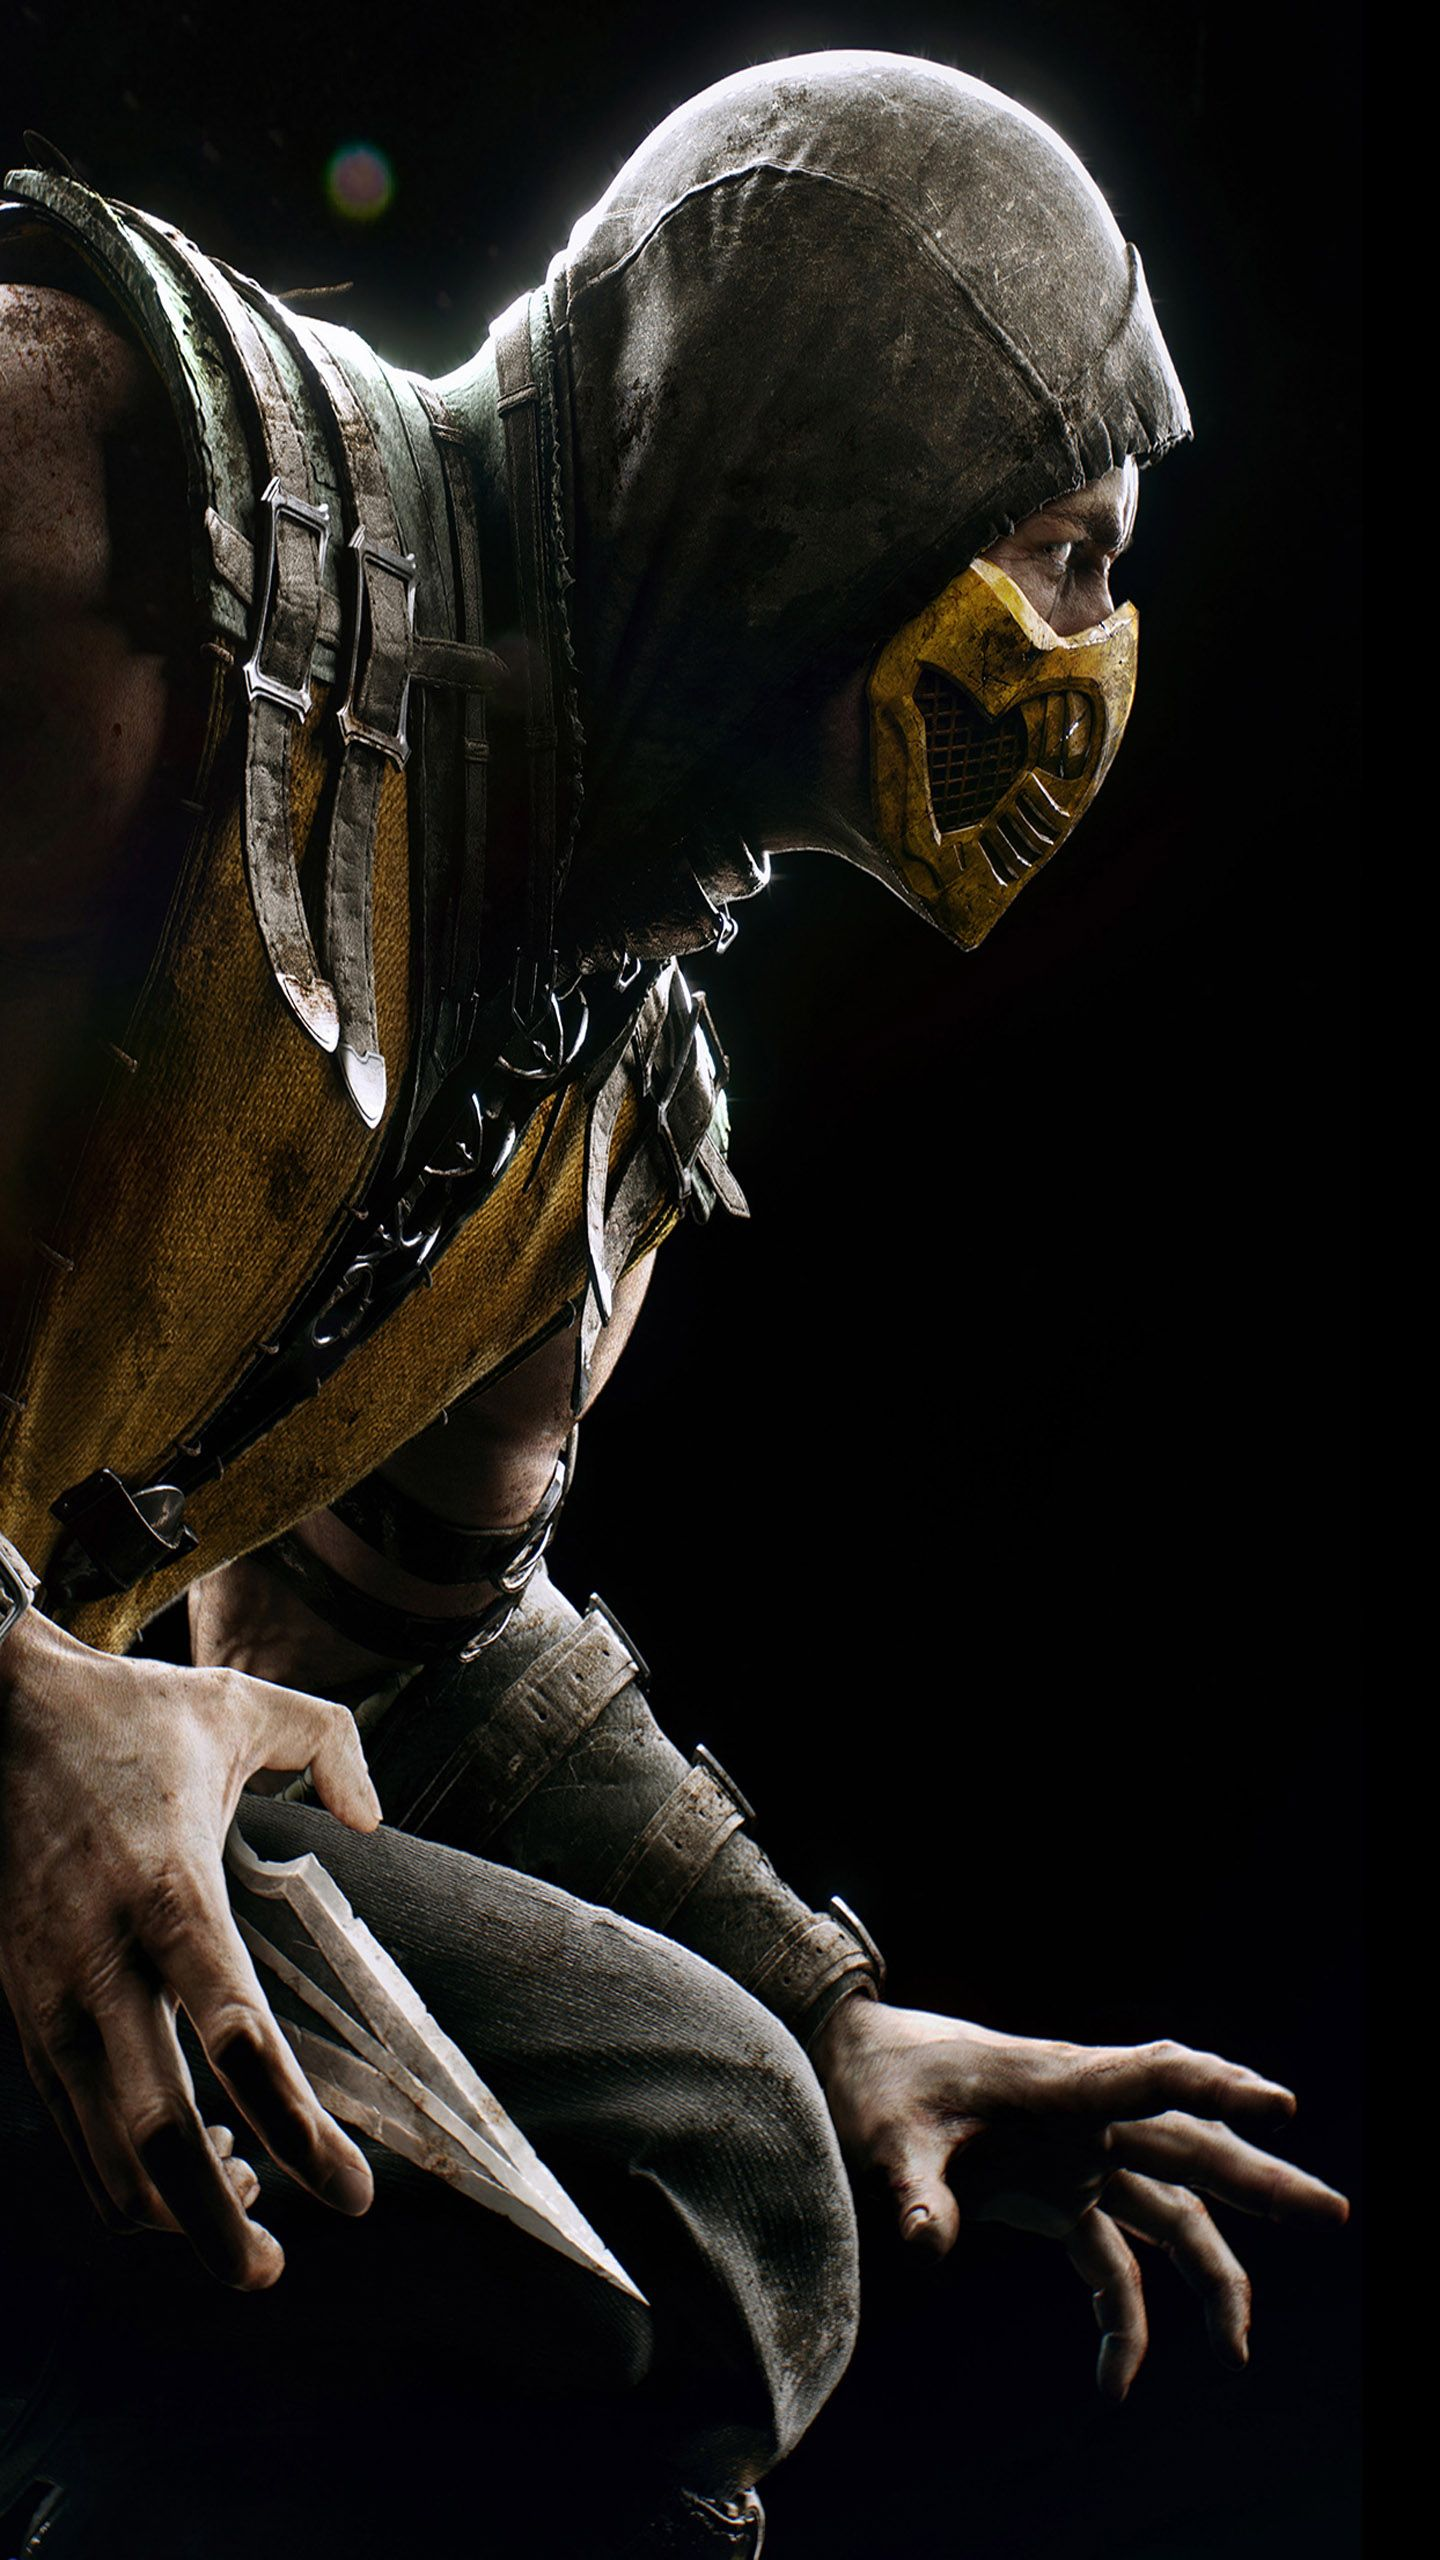 Mortal Kombat X Game Wallpaper For Samsung Galaxy S6 Mortal Kombat Scorpion Mortal Kombat X Scorpion Mortal Kombat